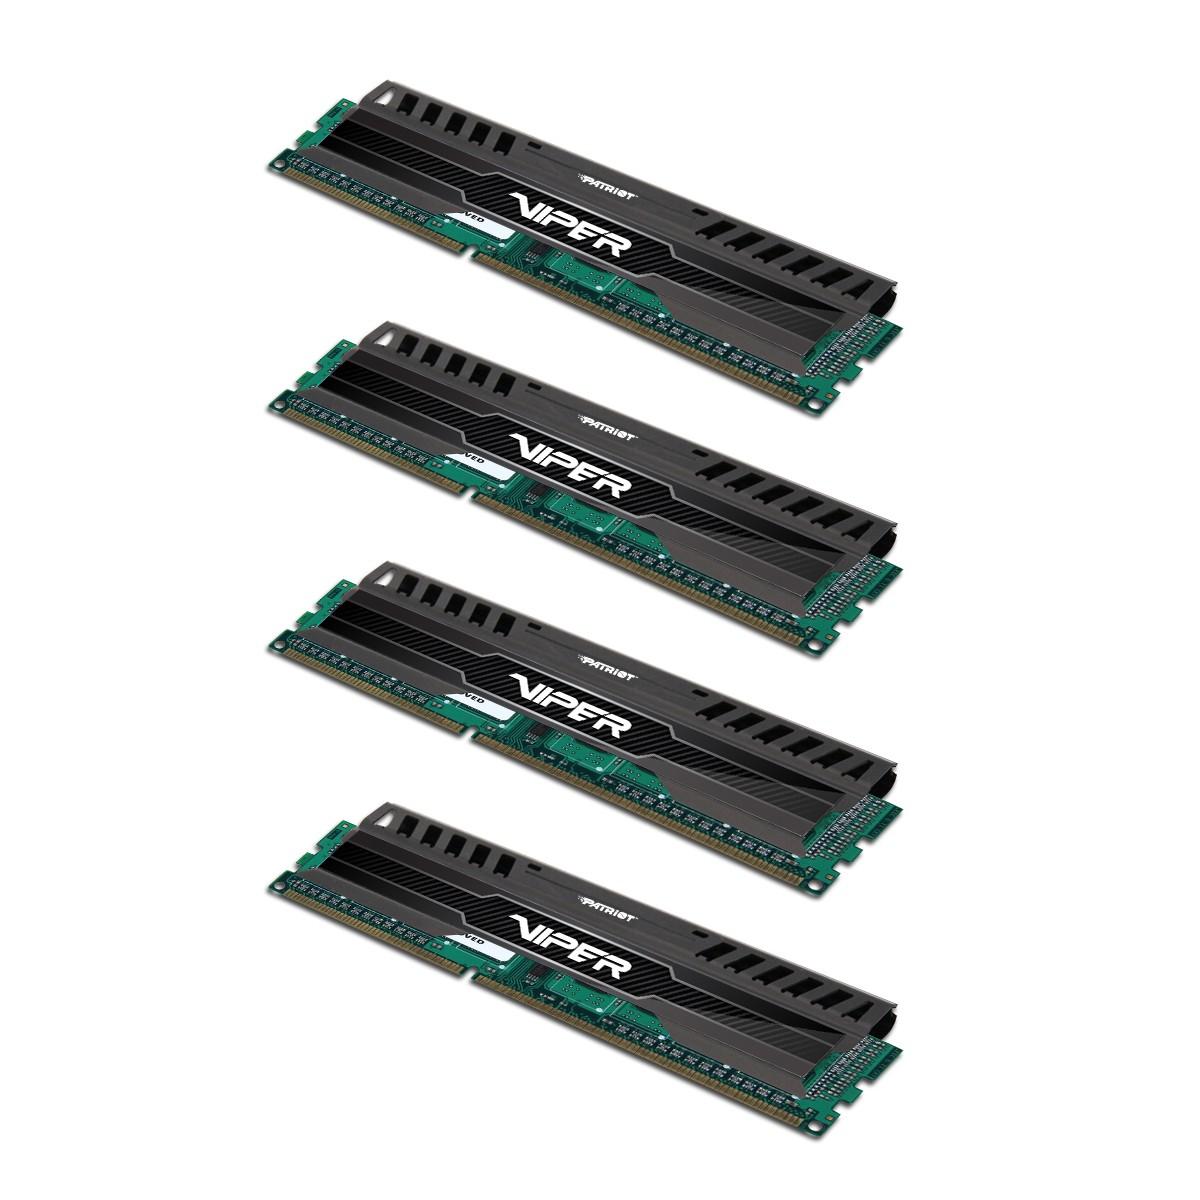 Memoria Viper 3 Black Mamba 16GB (4 x 4GB) DDR3 1600MHz Quad Channel Memory Kit PV316G160C9QK - Patriot